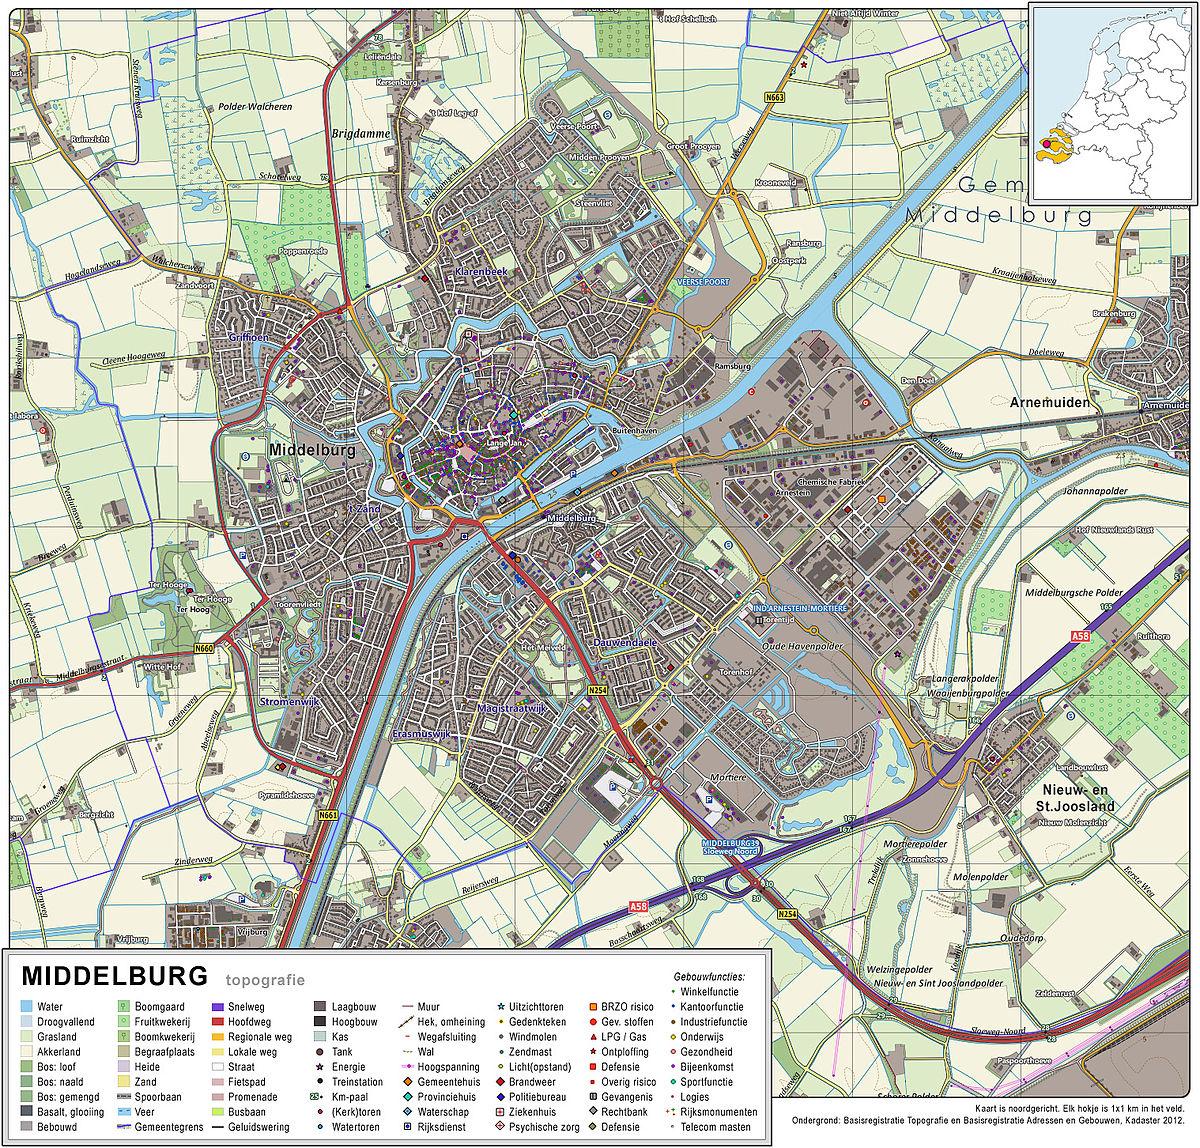 Middelburg Zeeland Travel guide at Wikivoyage